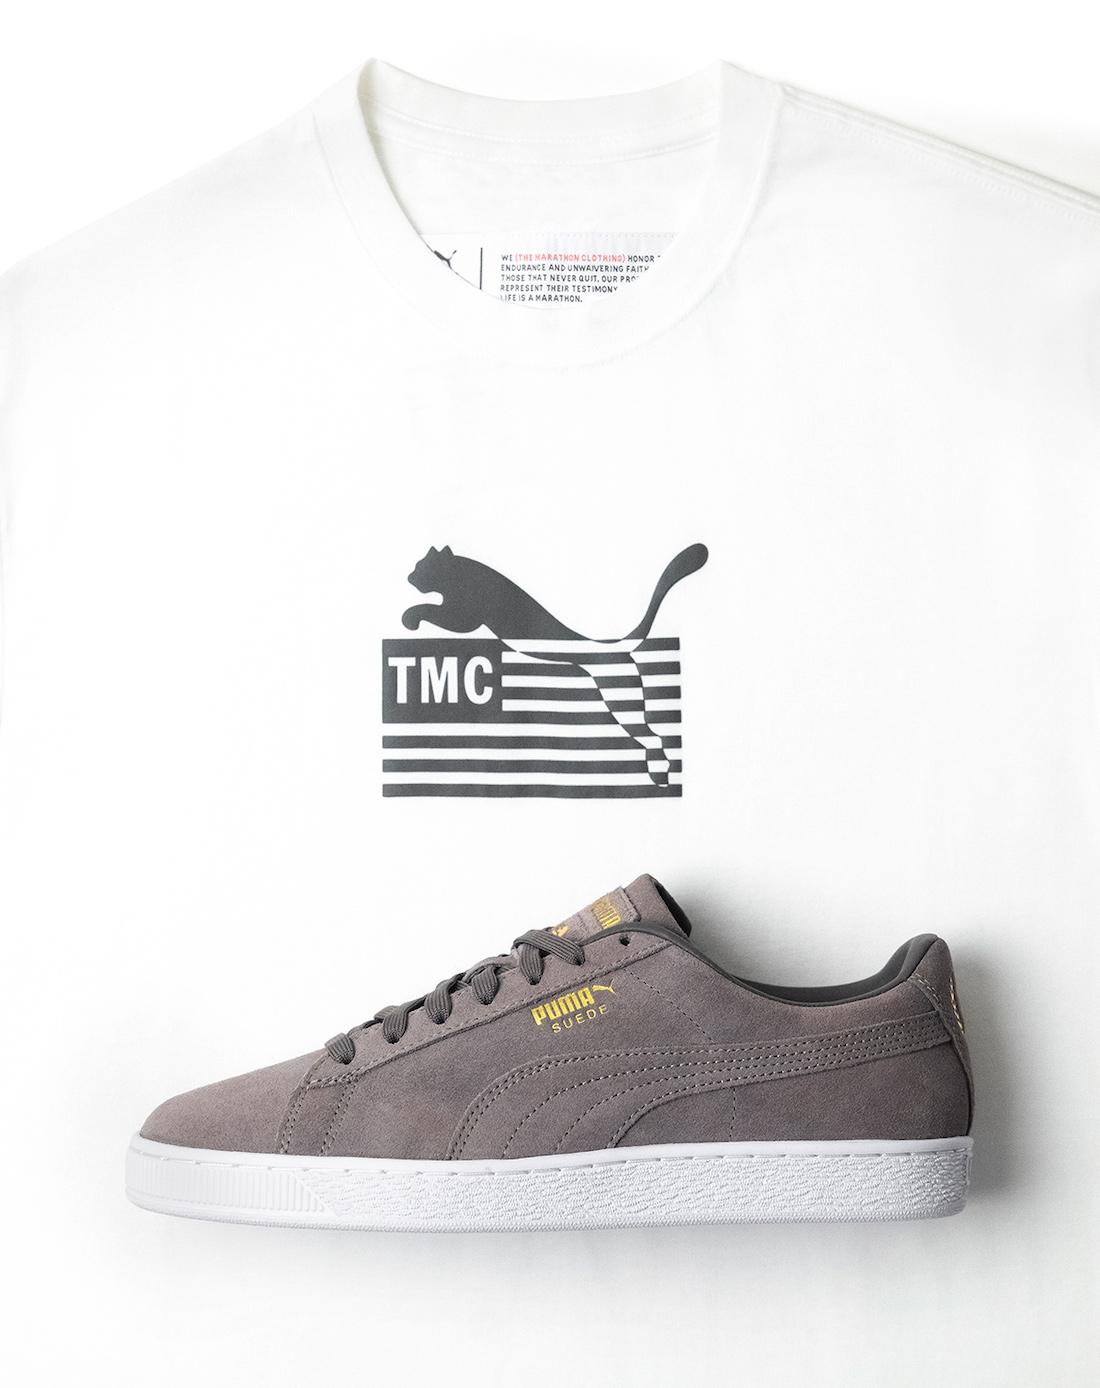 nipsey-hussle-tmc-puma-suede-shoes-shirt-where-to-buy